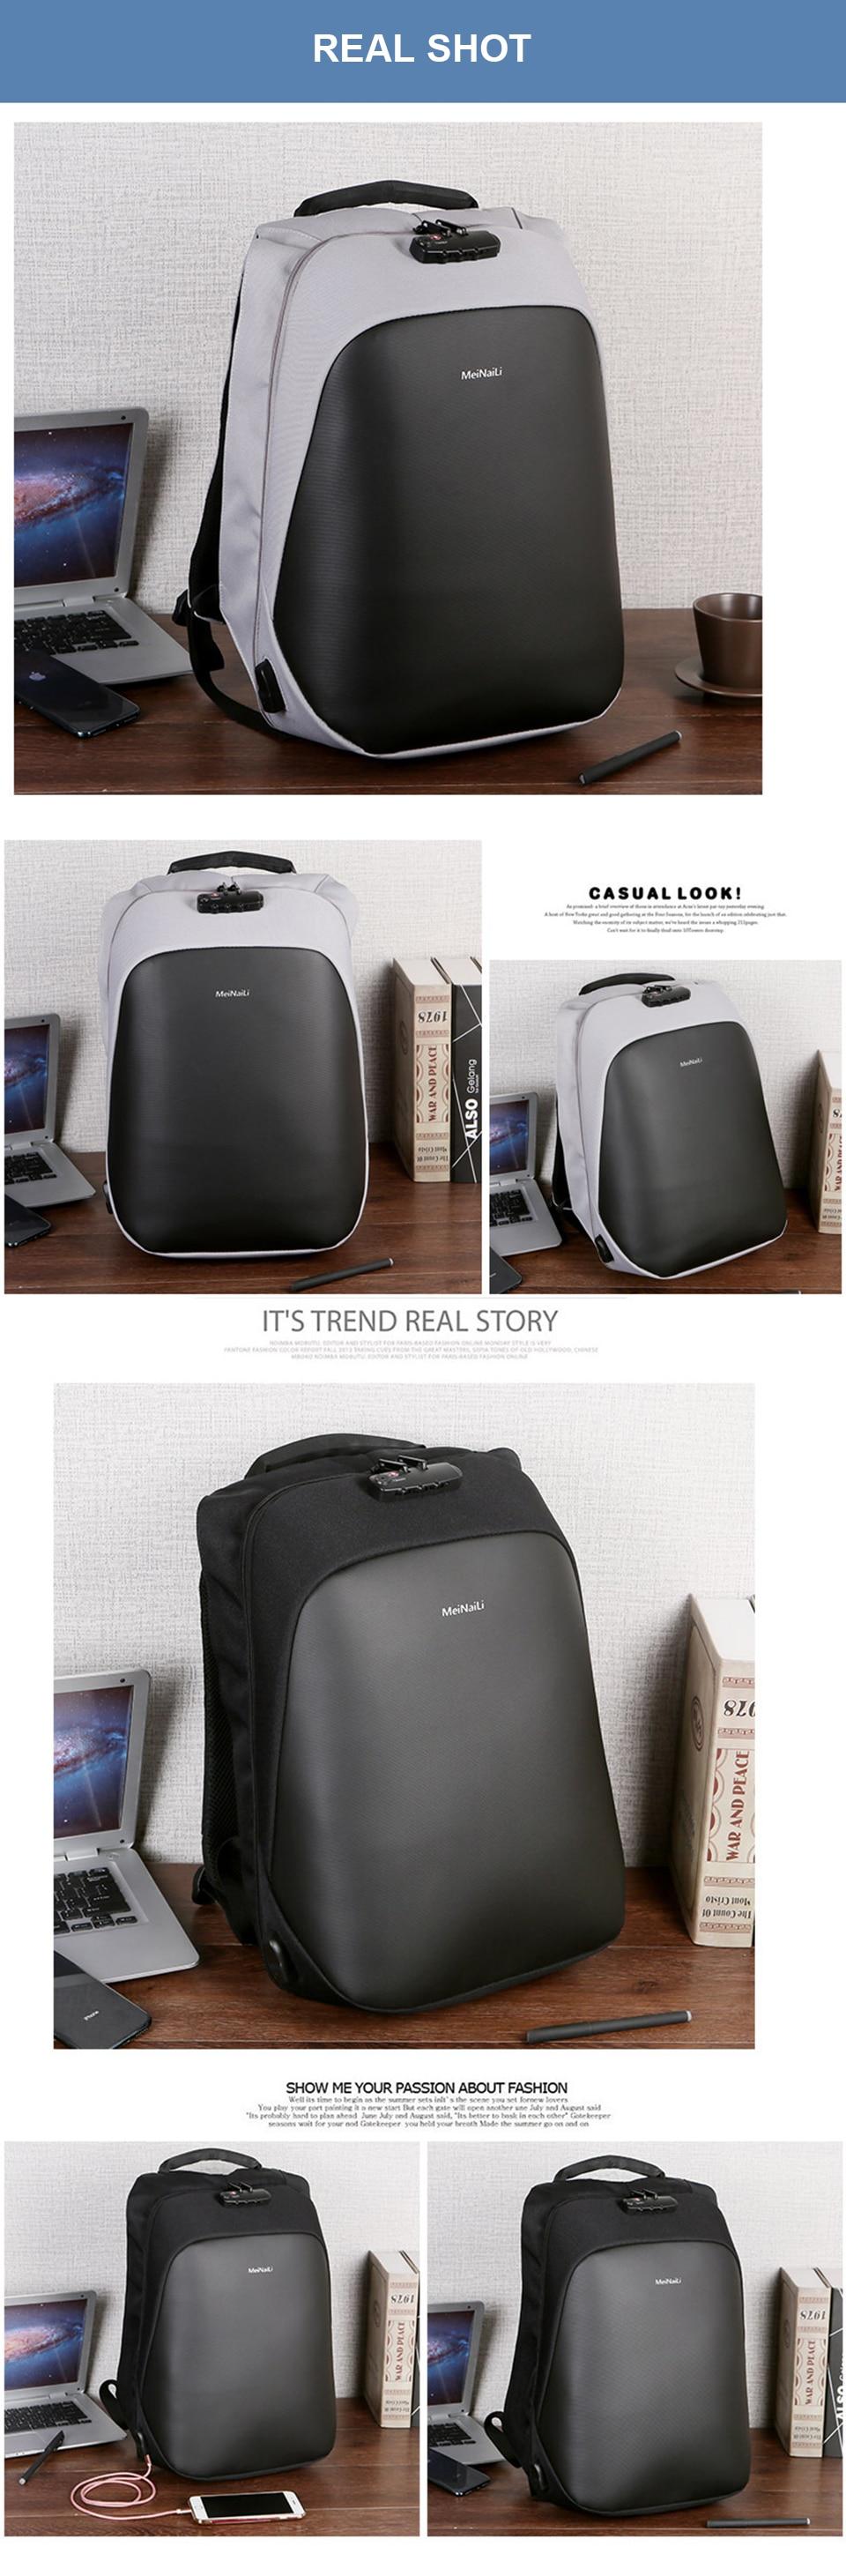 9 Anti-theft Backpack Men Backpacks Laptop 15.6'' Business Travel Luggage Bag Pack Waterproof USB Password Lock Male Backpacking